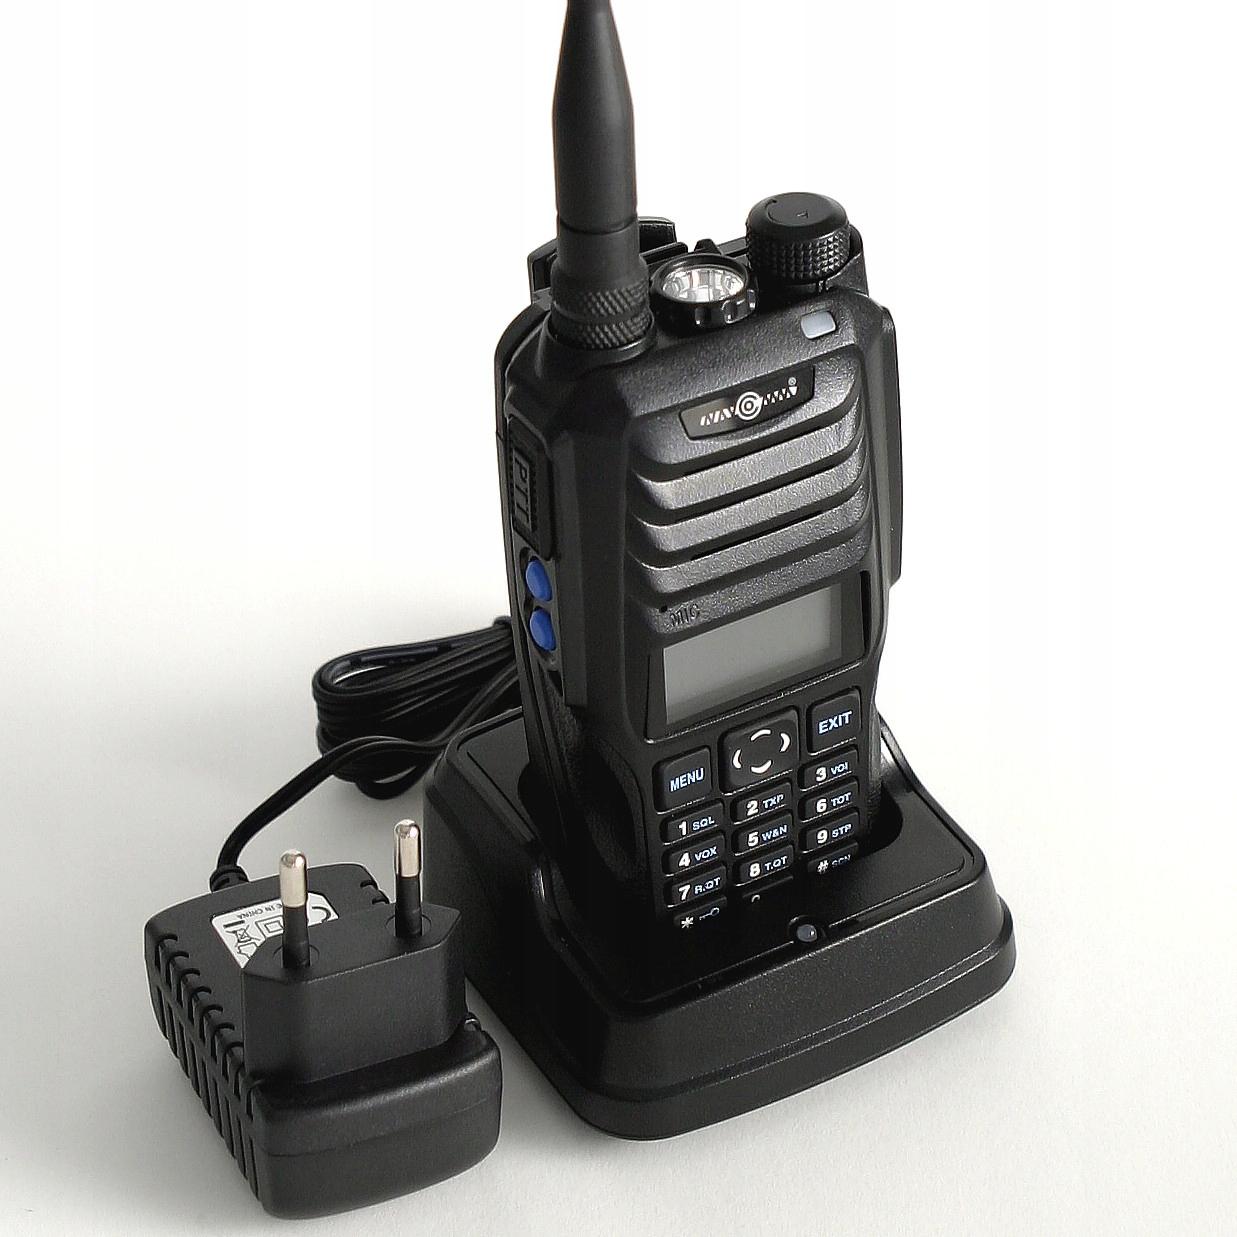 NC-900 Rádiová stanica Duobander Navcomm, 10W, 2600MAH